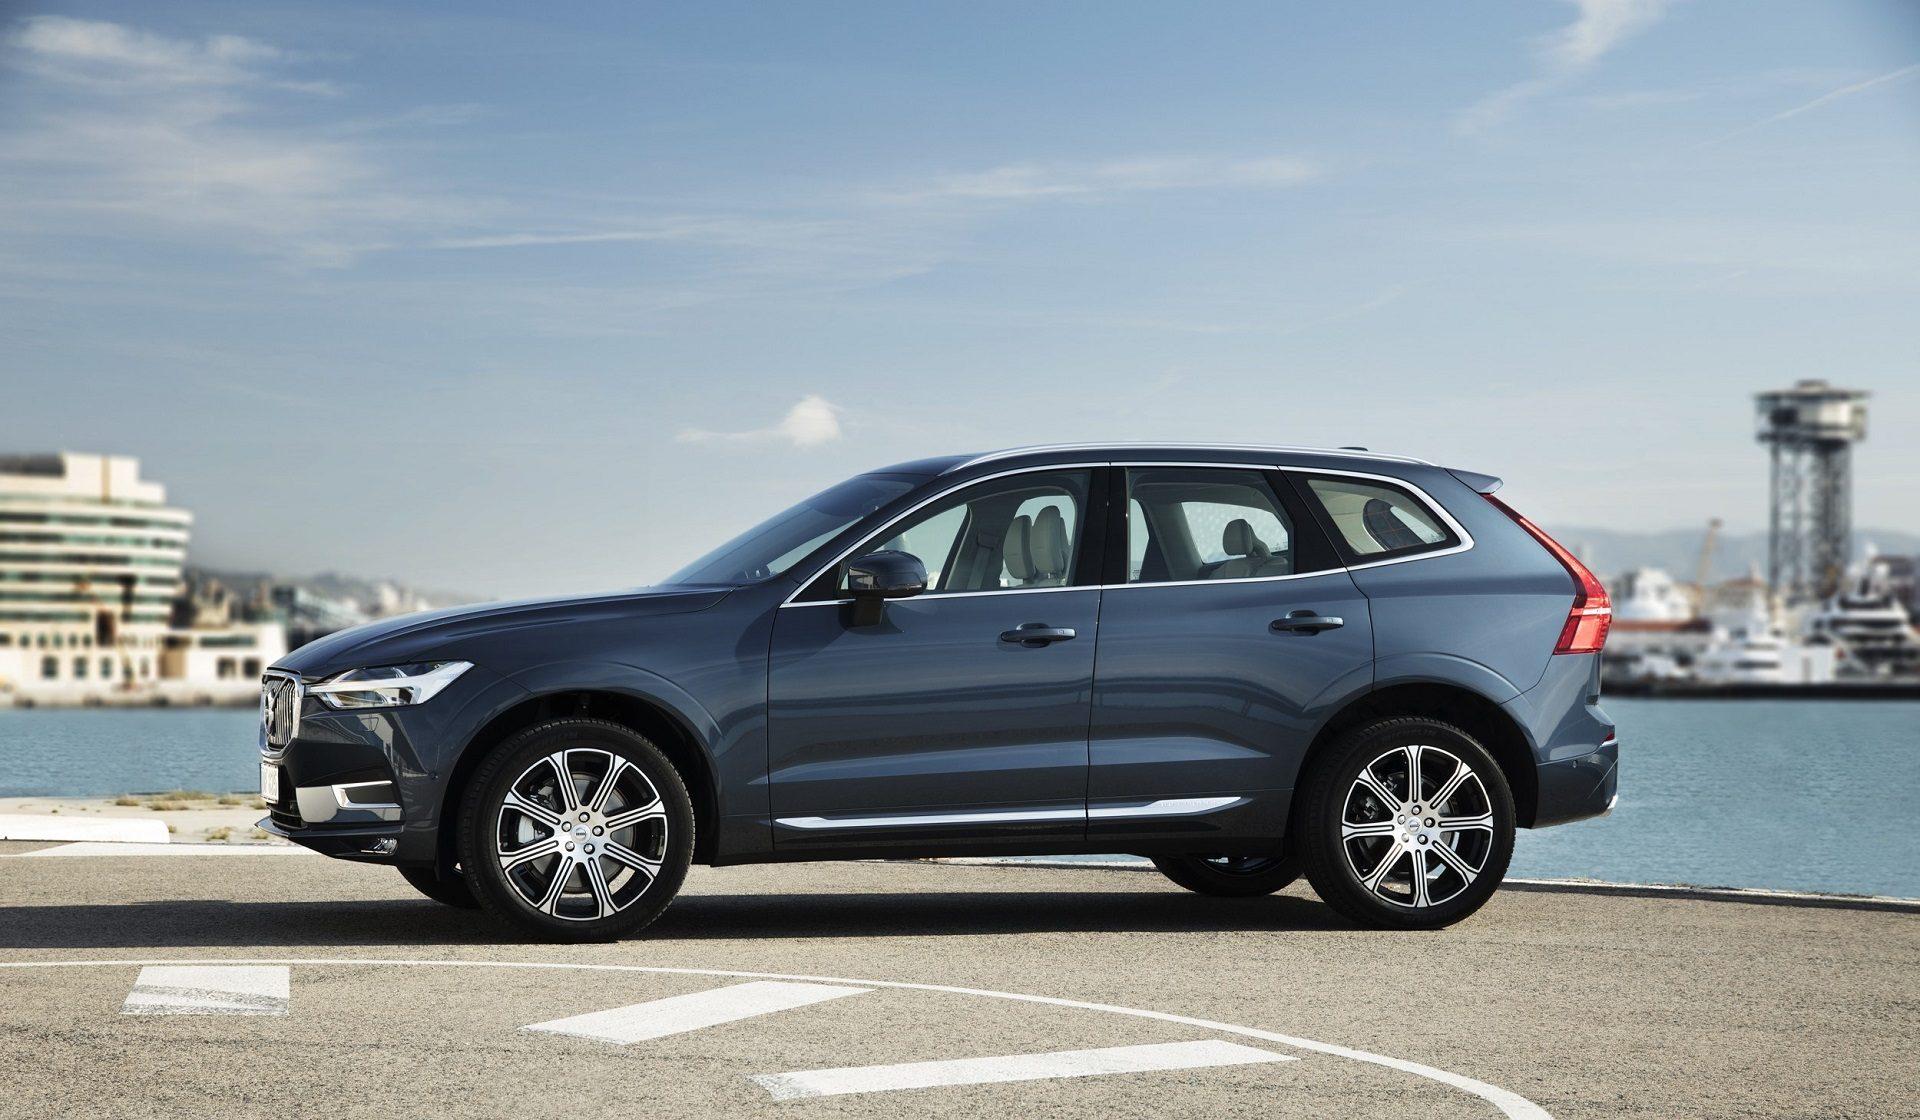 Volvo Cars' new XC60